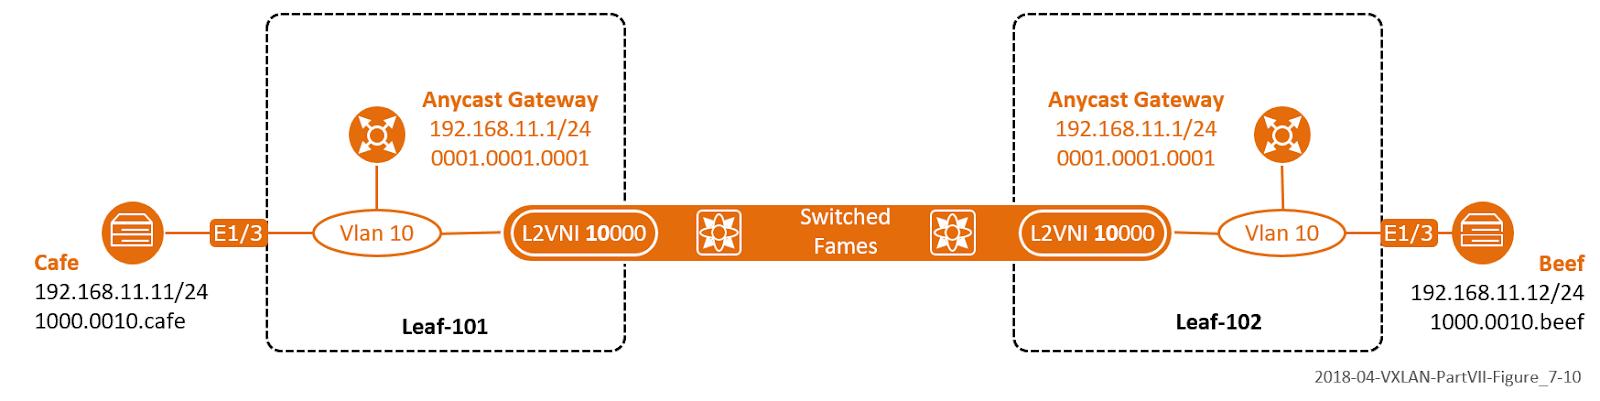 The Network Times: VXLAN Part VII: VXLAN BGP EVPN –Control Plane